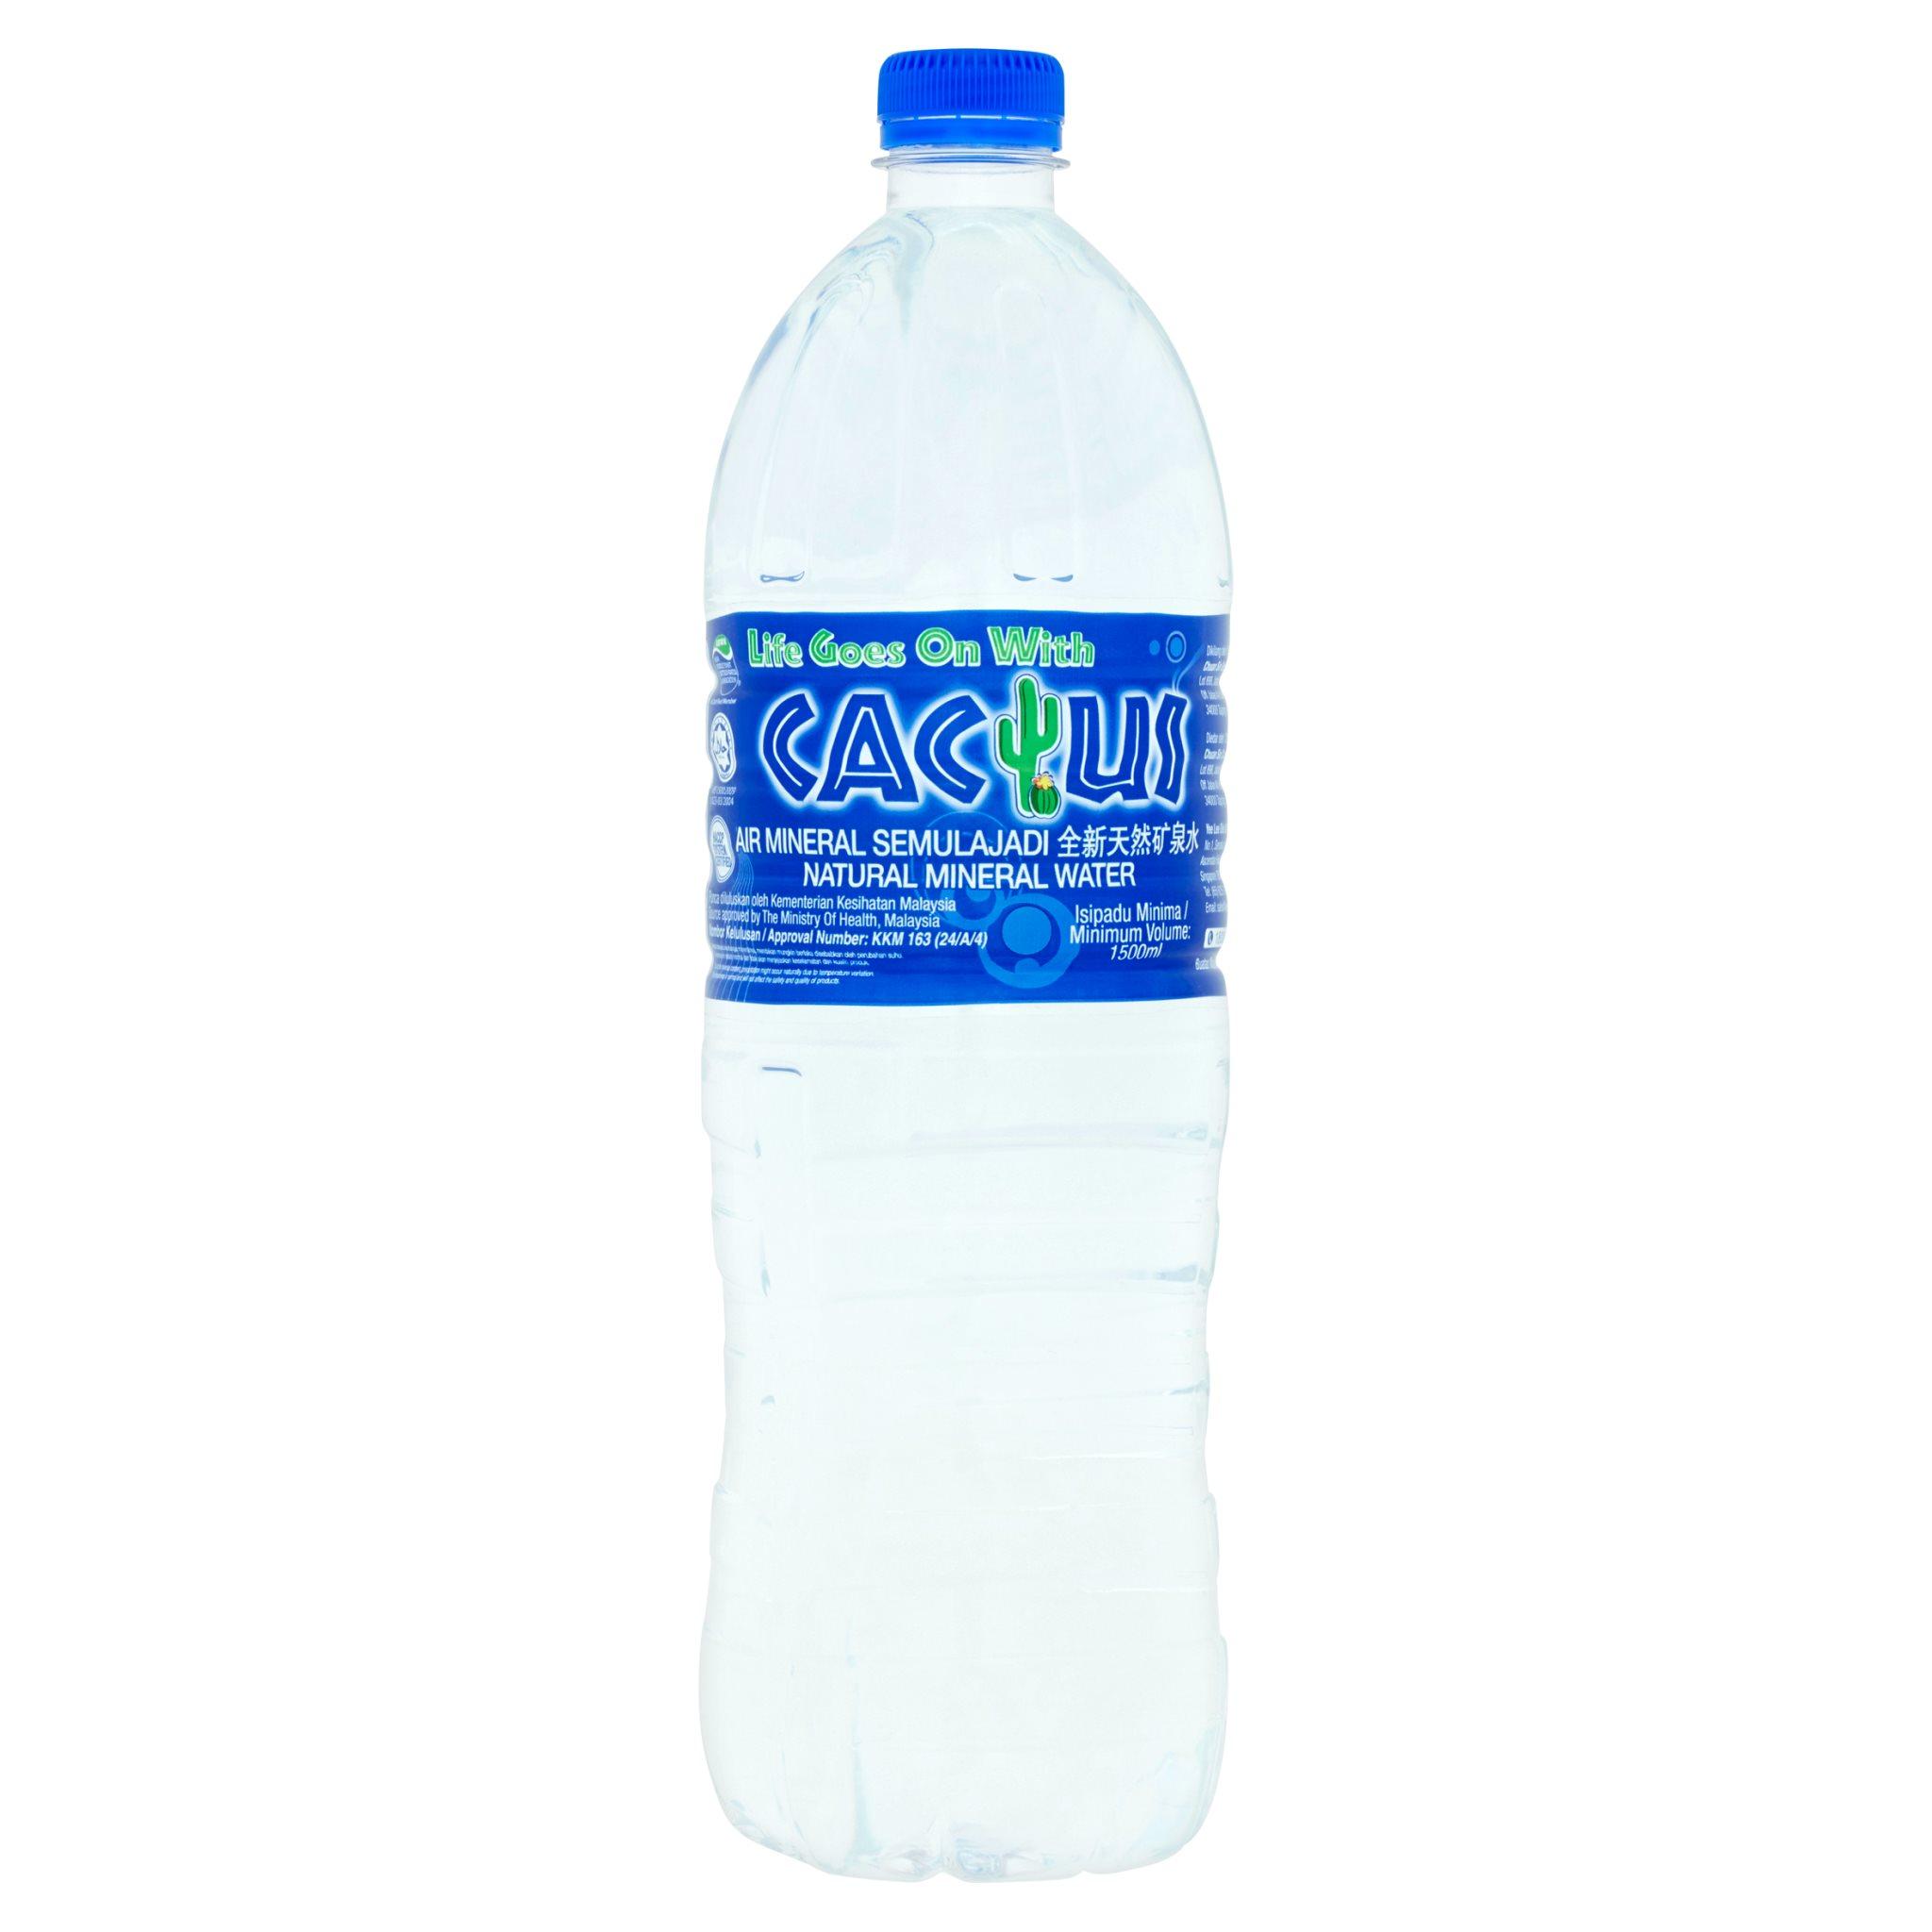 Cactus Natural Mineral Water (1.5L)